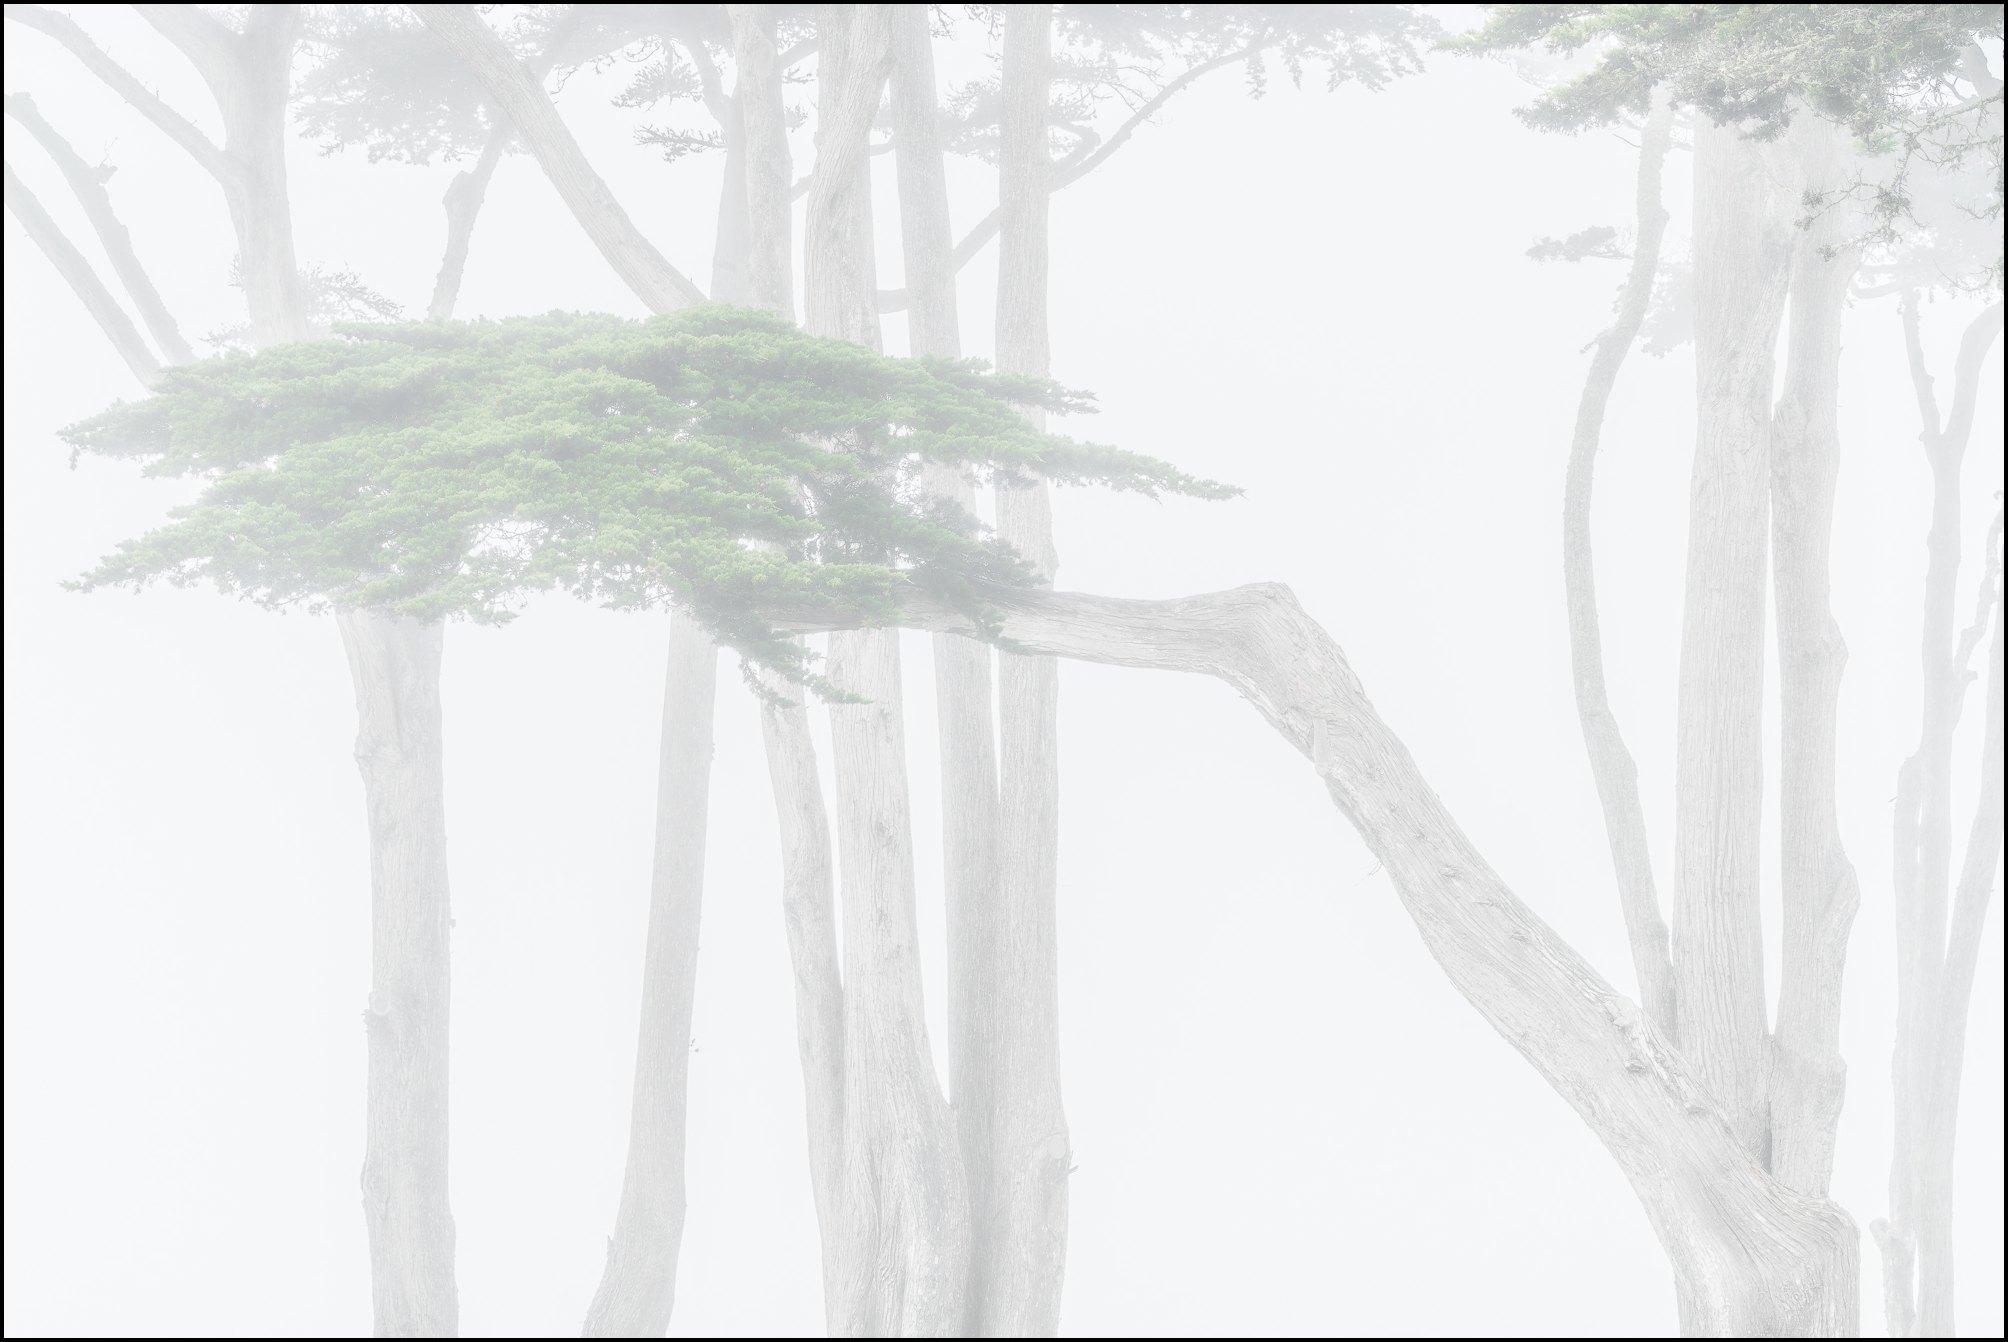 Cypress trees in fog, Monterey, California 2019 William Neill